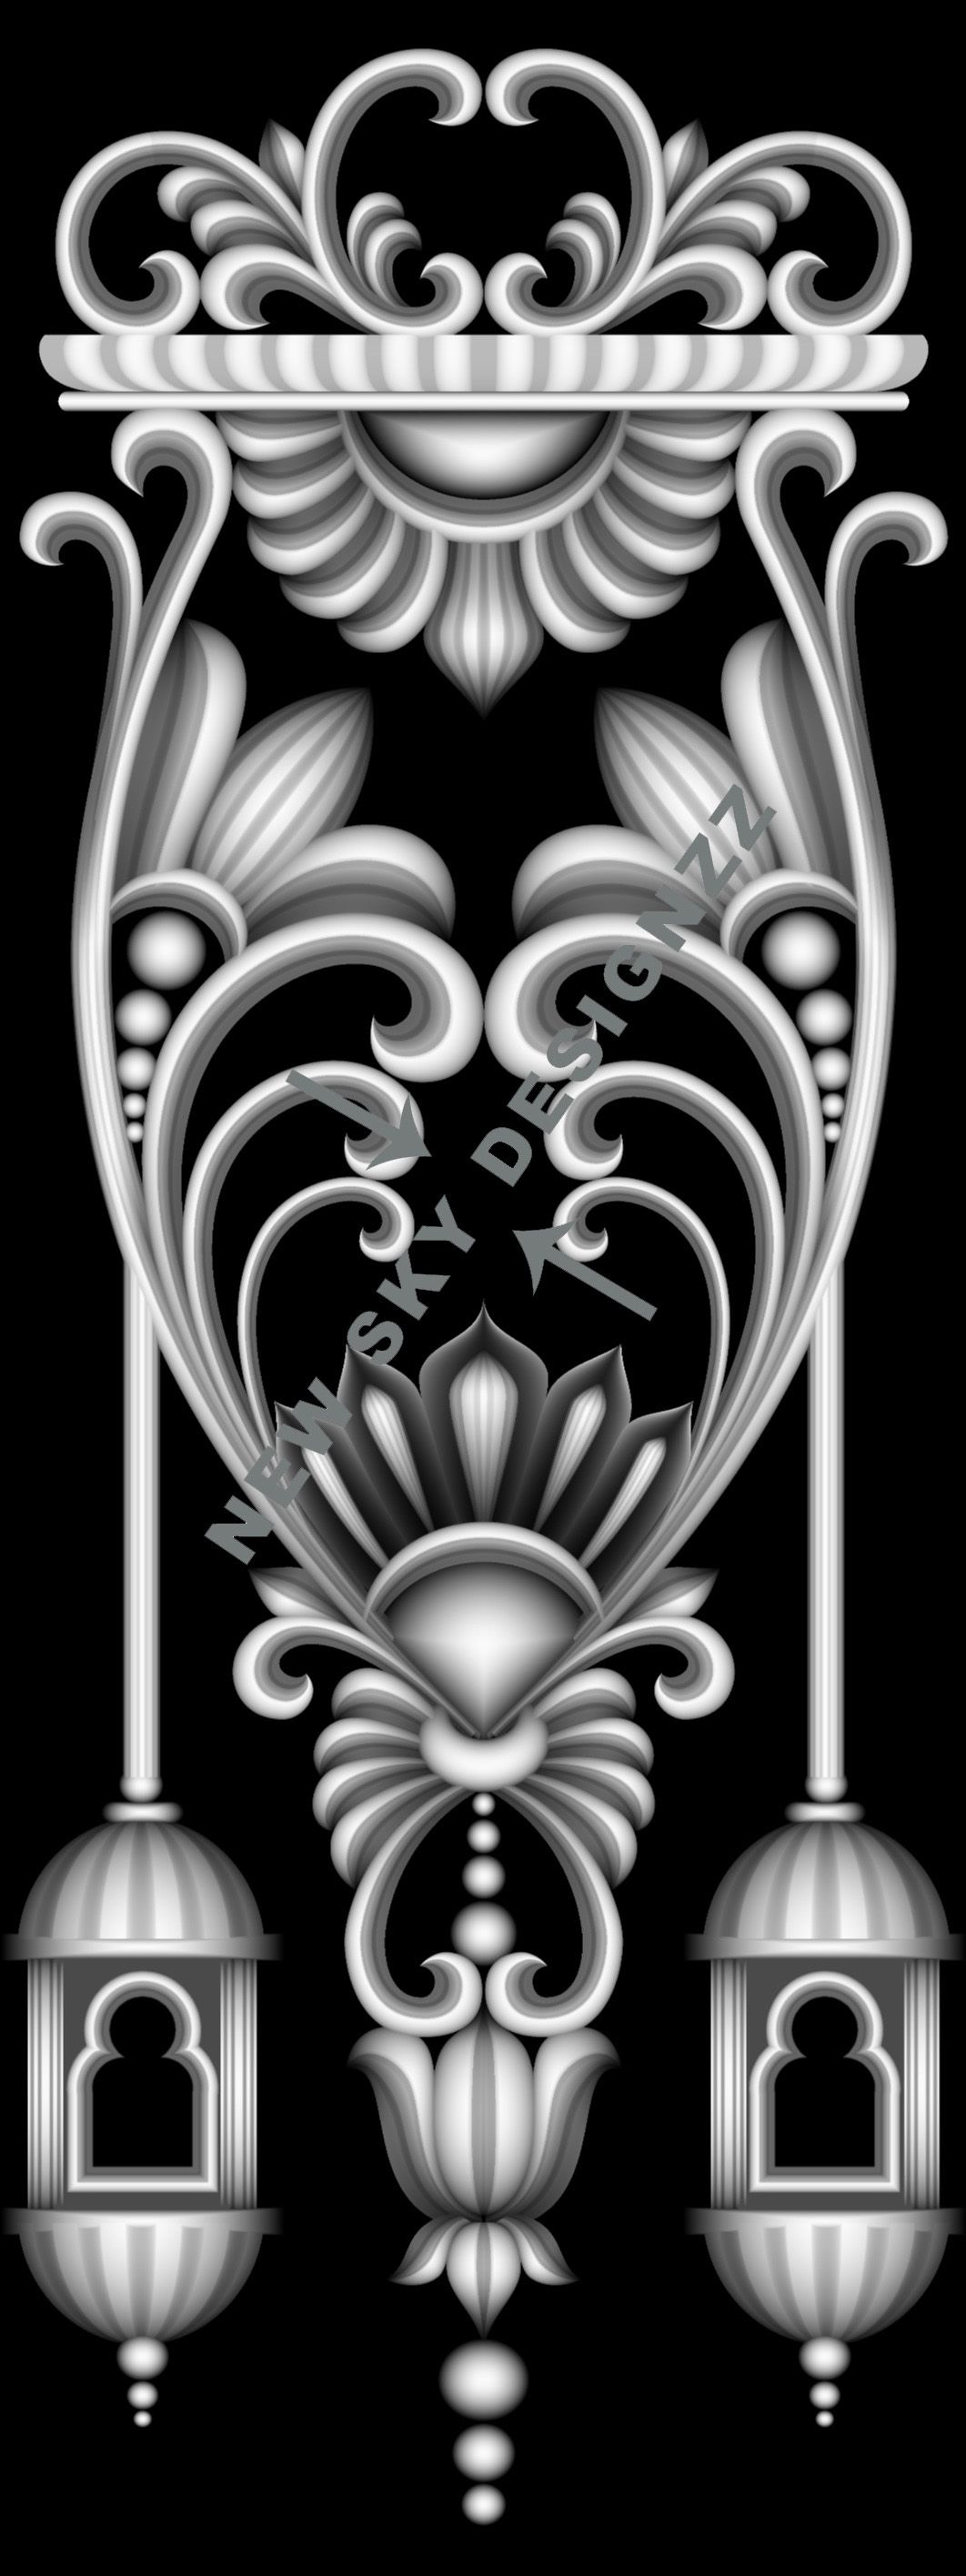 fd tumkur woodcarving shilpakalamandira gmail com  4affb525a440caae8761f726ac8bb0a8 jpg